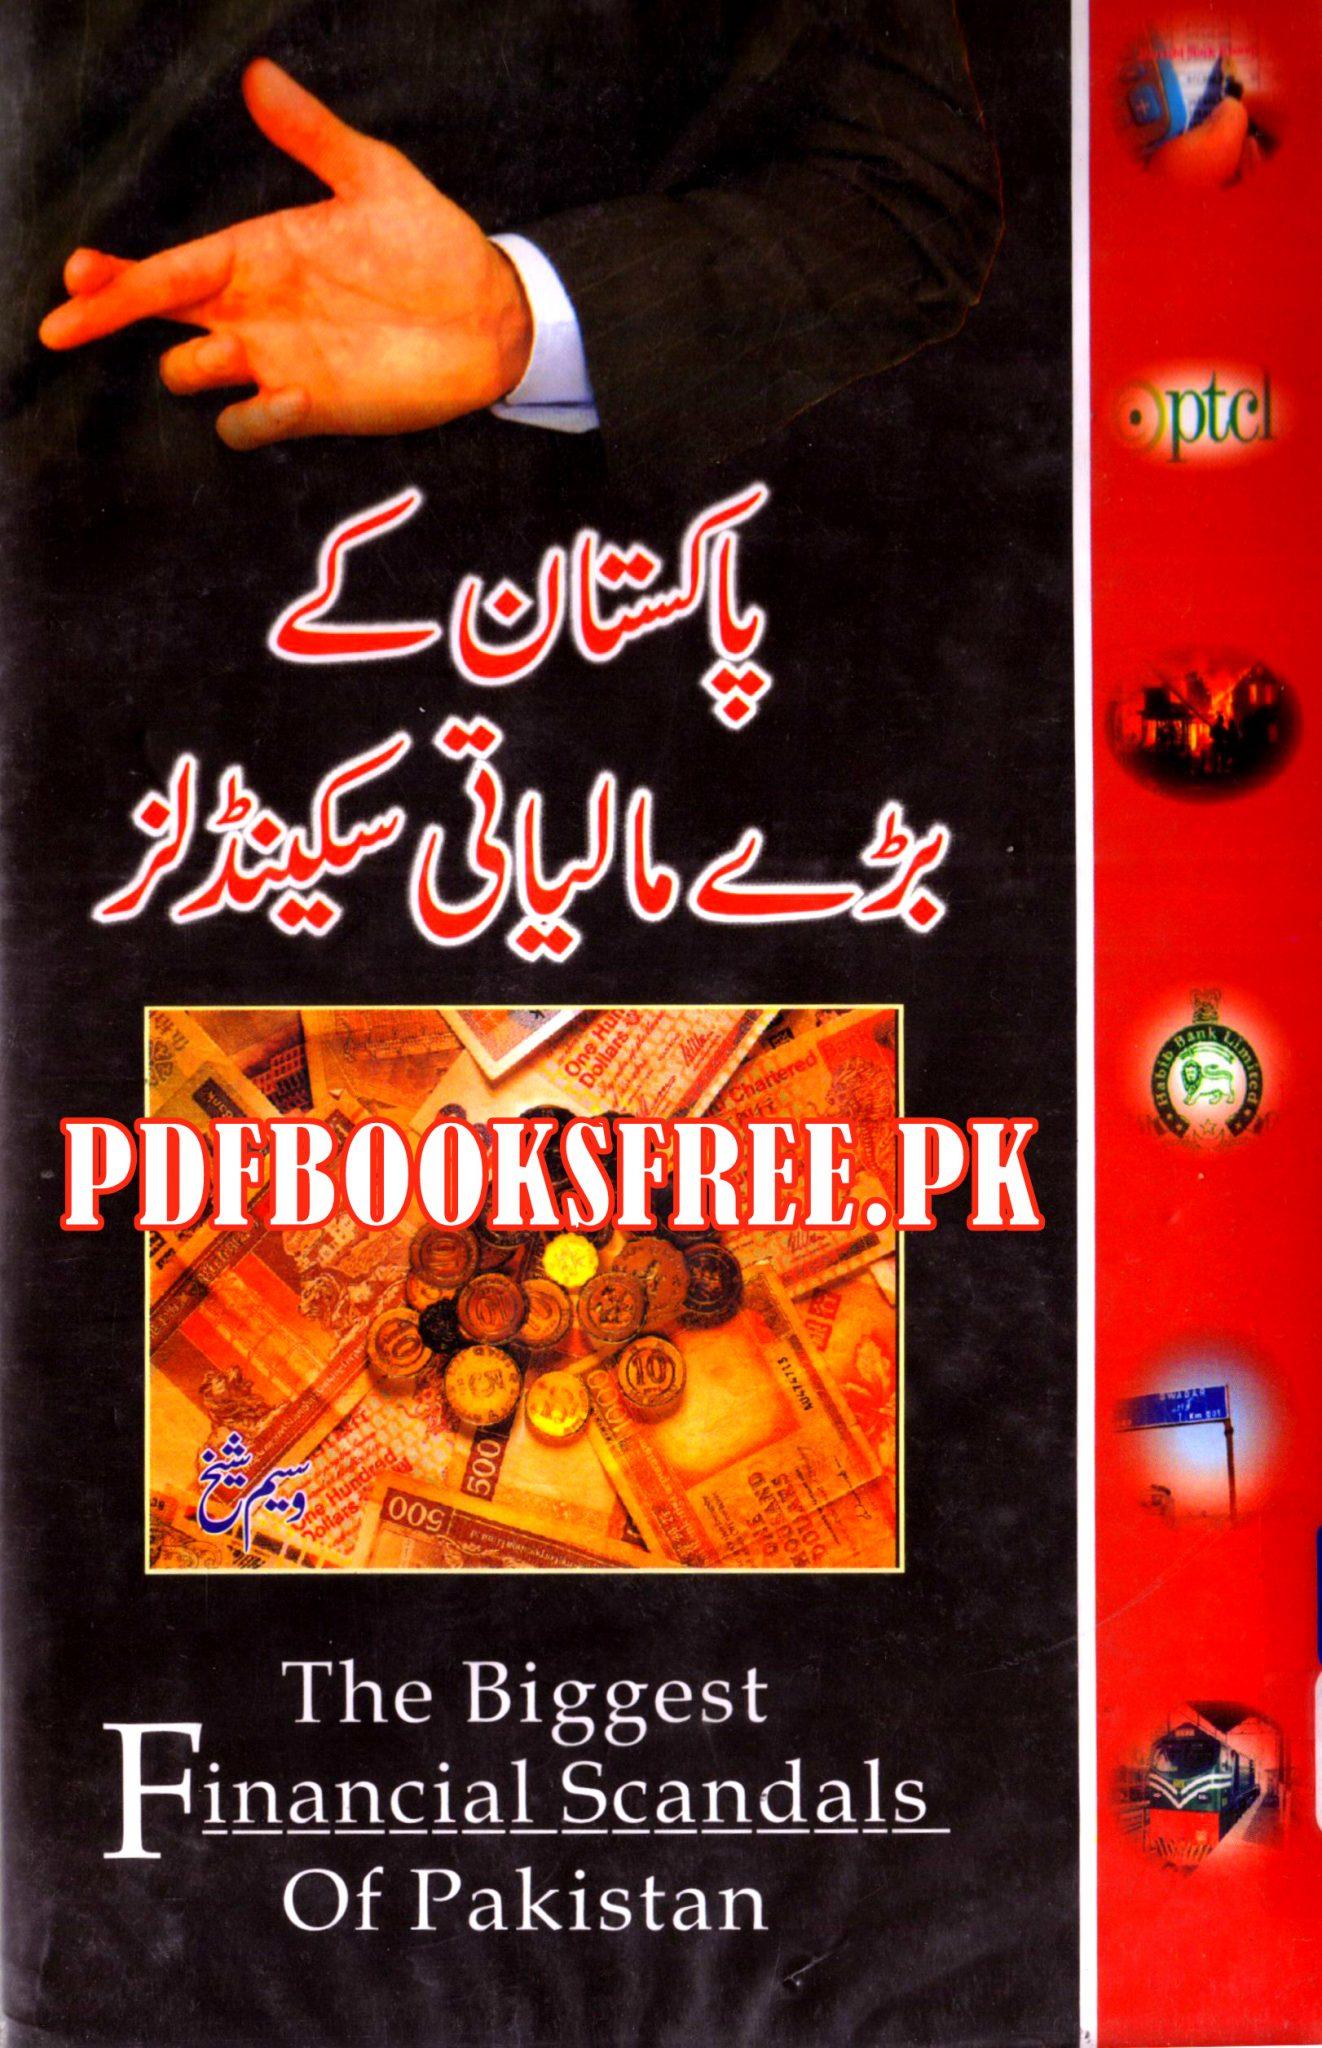 The Biggest Financial Scandals of Pakistan in Urdu pdf